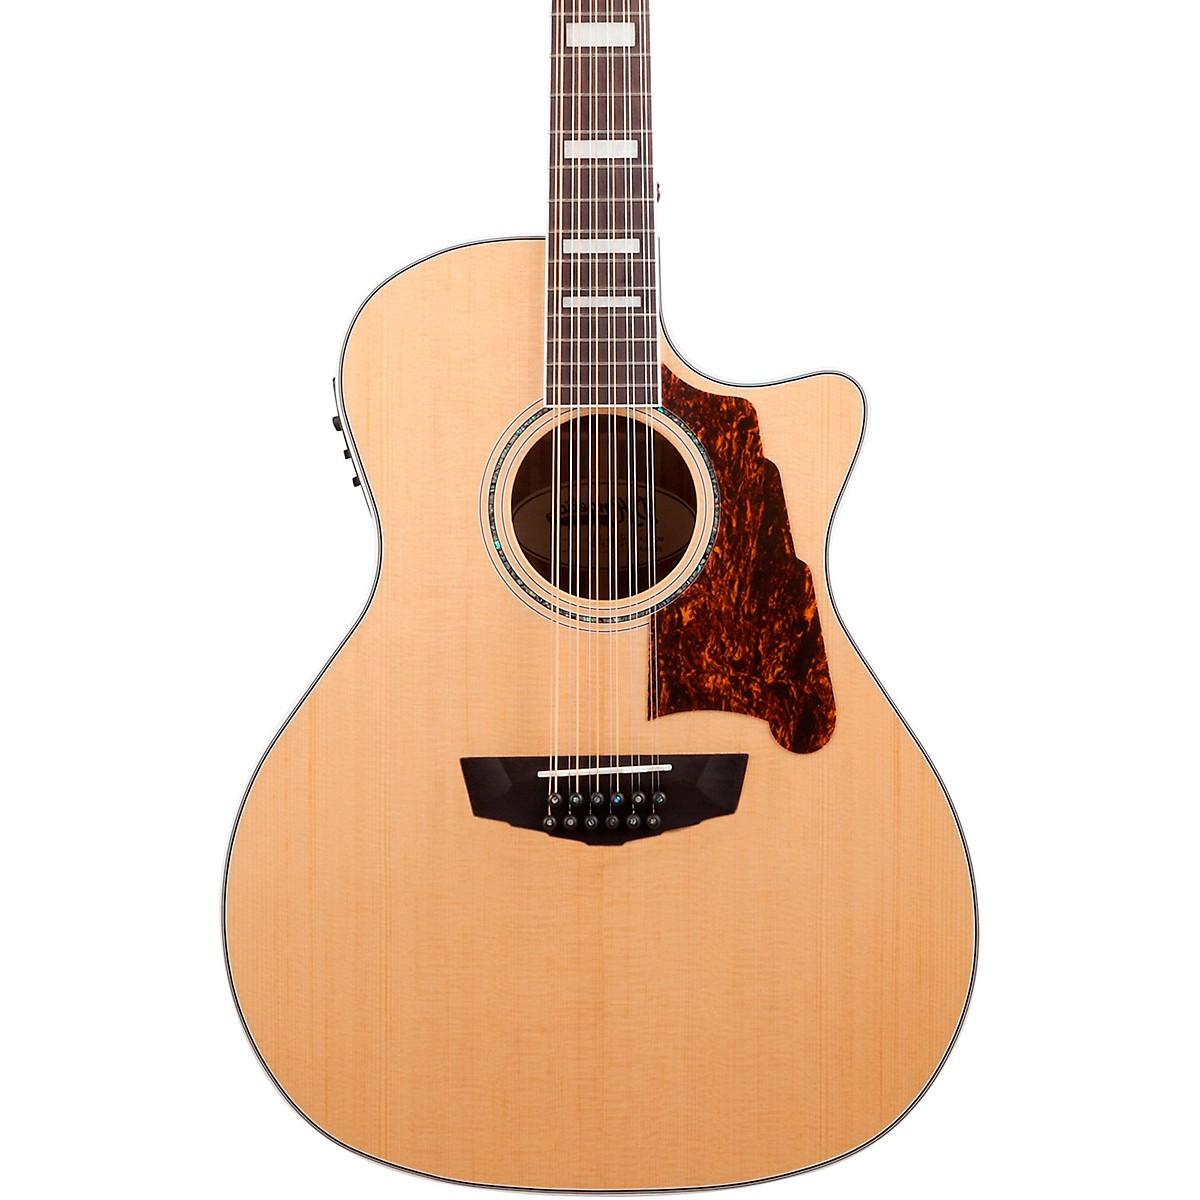 D'Angelico Premier Fulton 12-String Acoustic-Electric Guitar